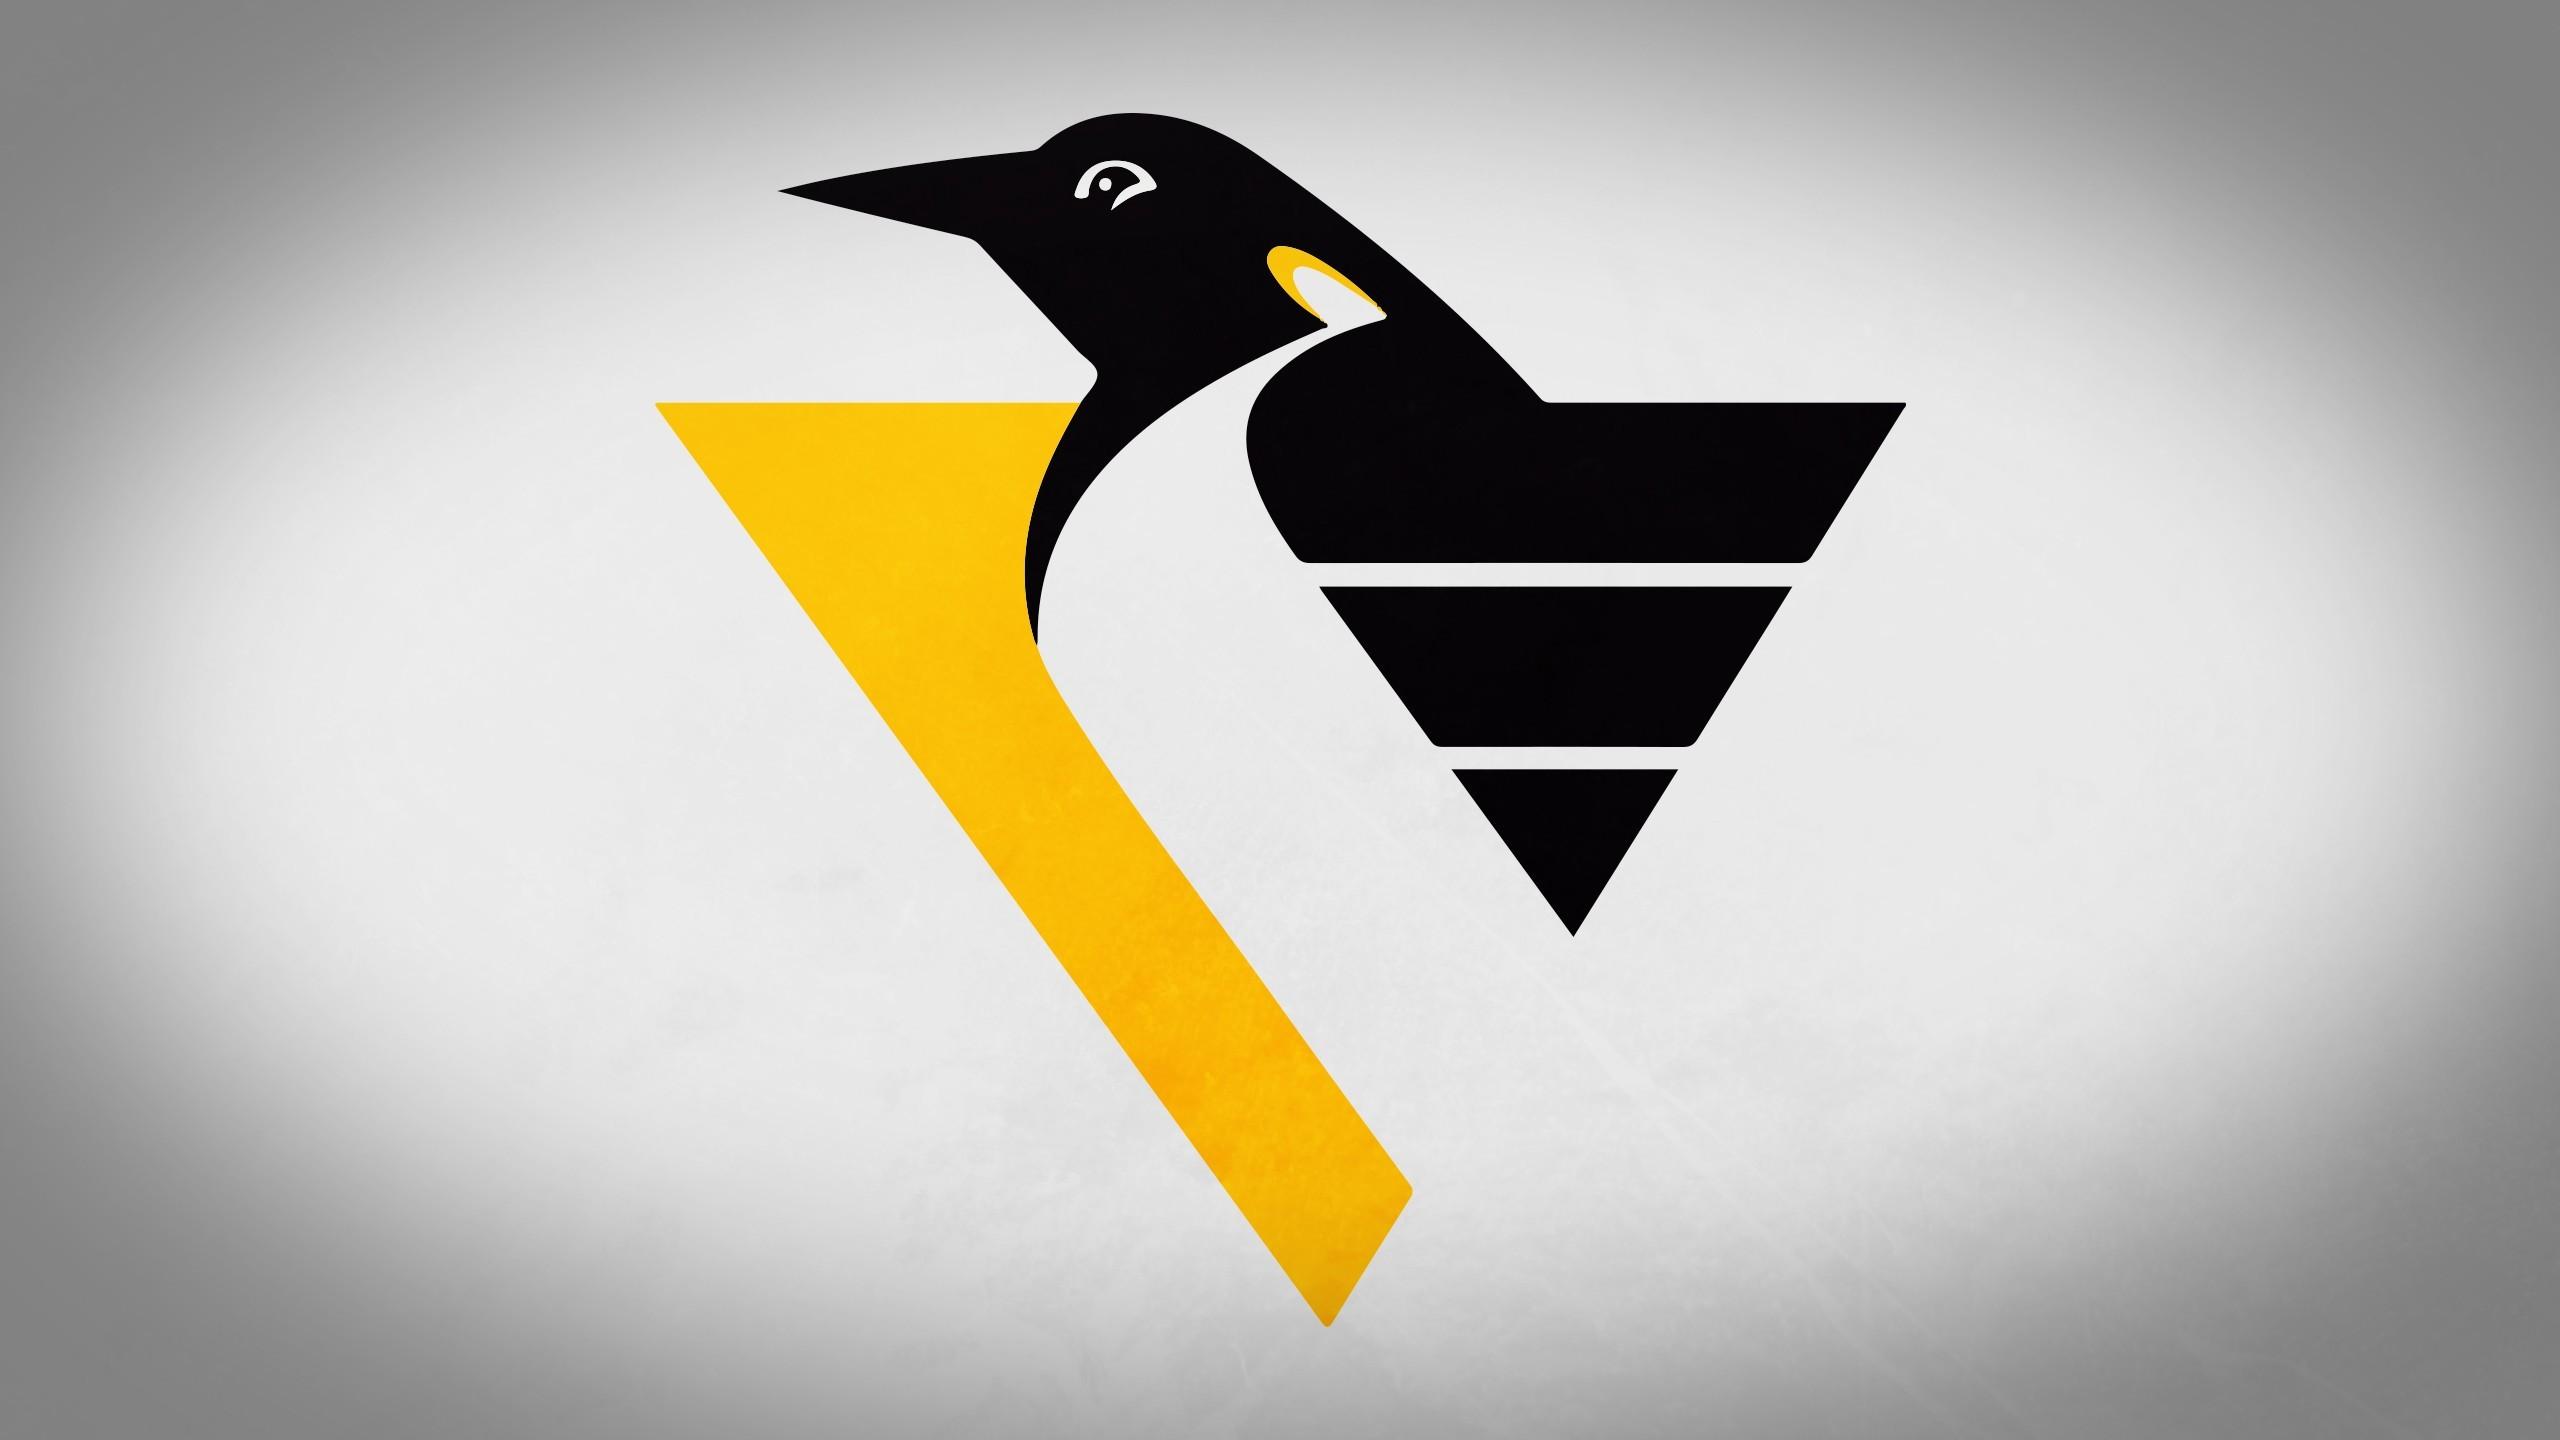 Pittsburgh Penguins Backgrounds Wallpaper | HD Wallpapers | Pinterest | Hd  wallpaper and Wallpaper